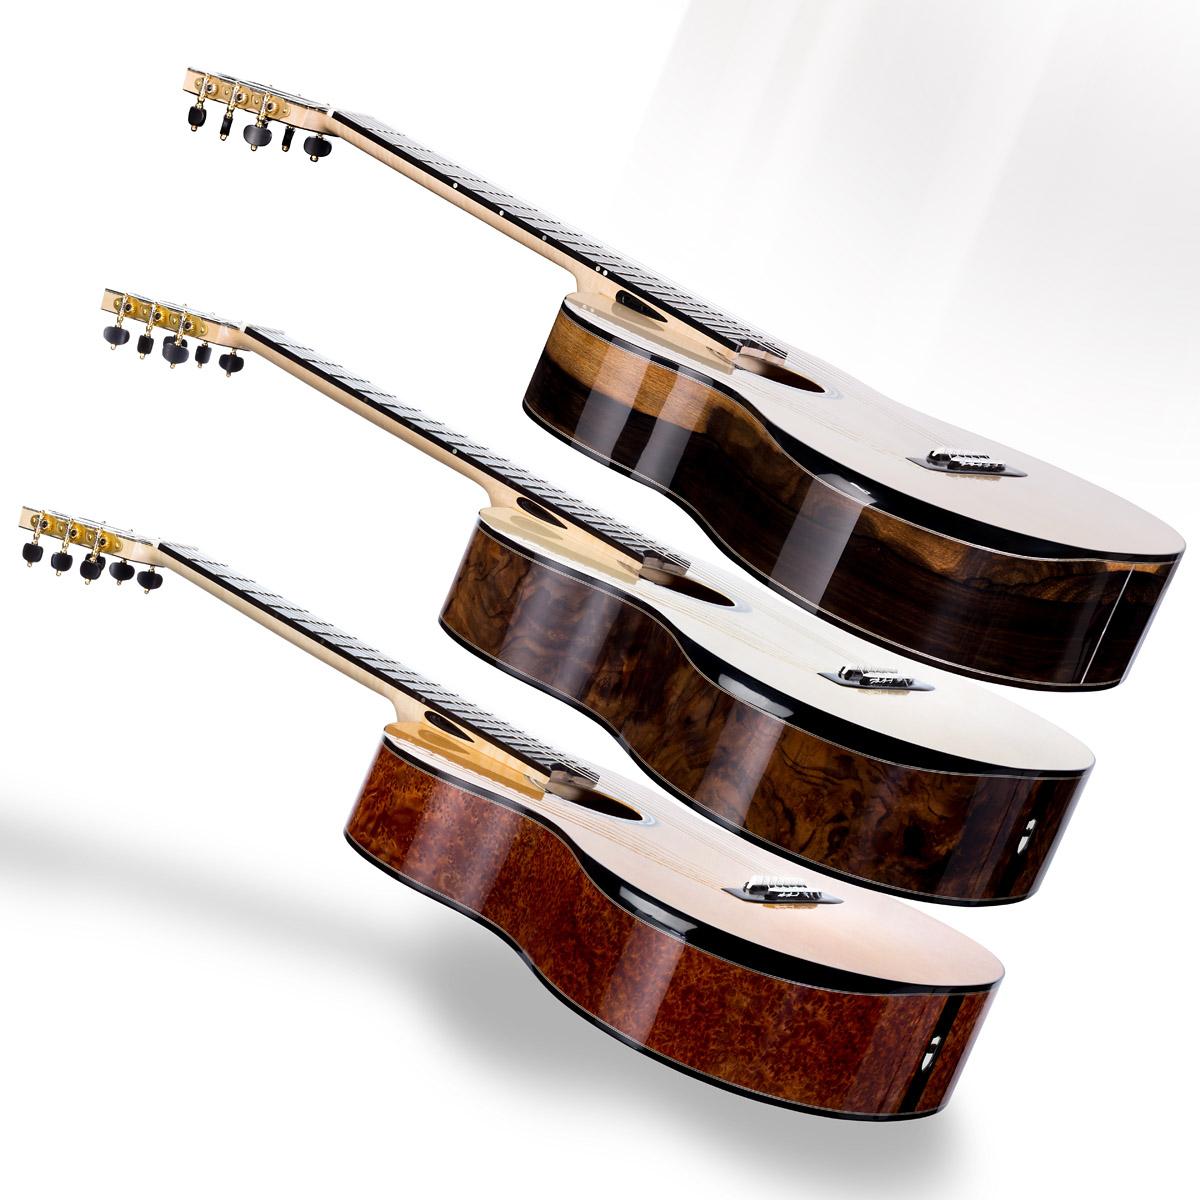 Gitary lutnicze